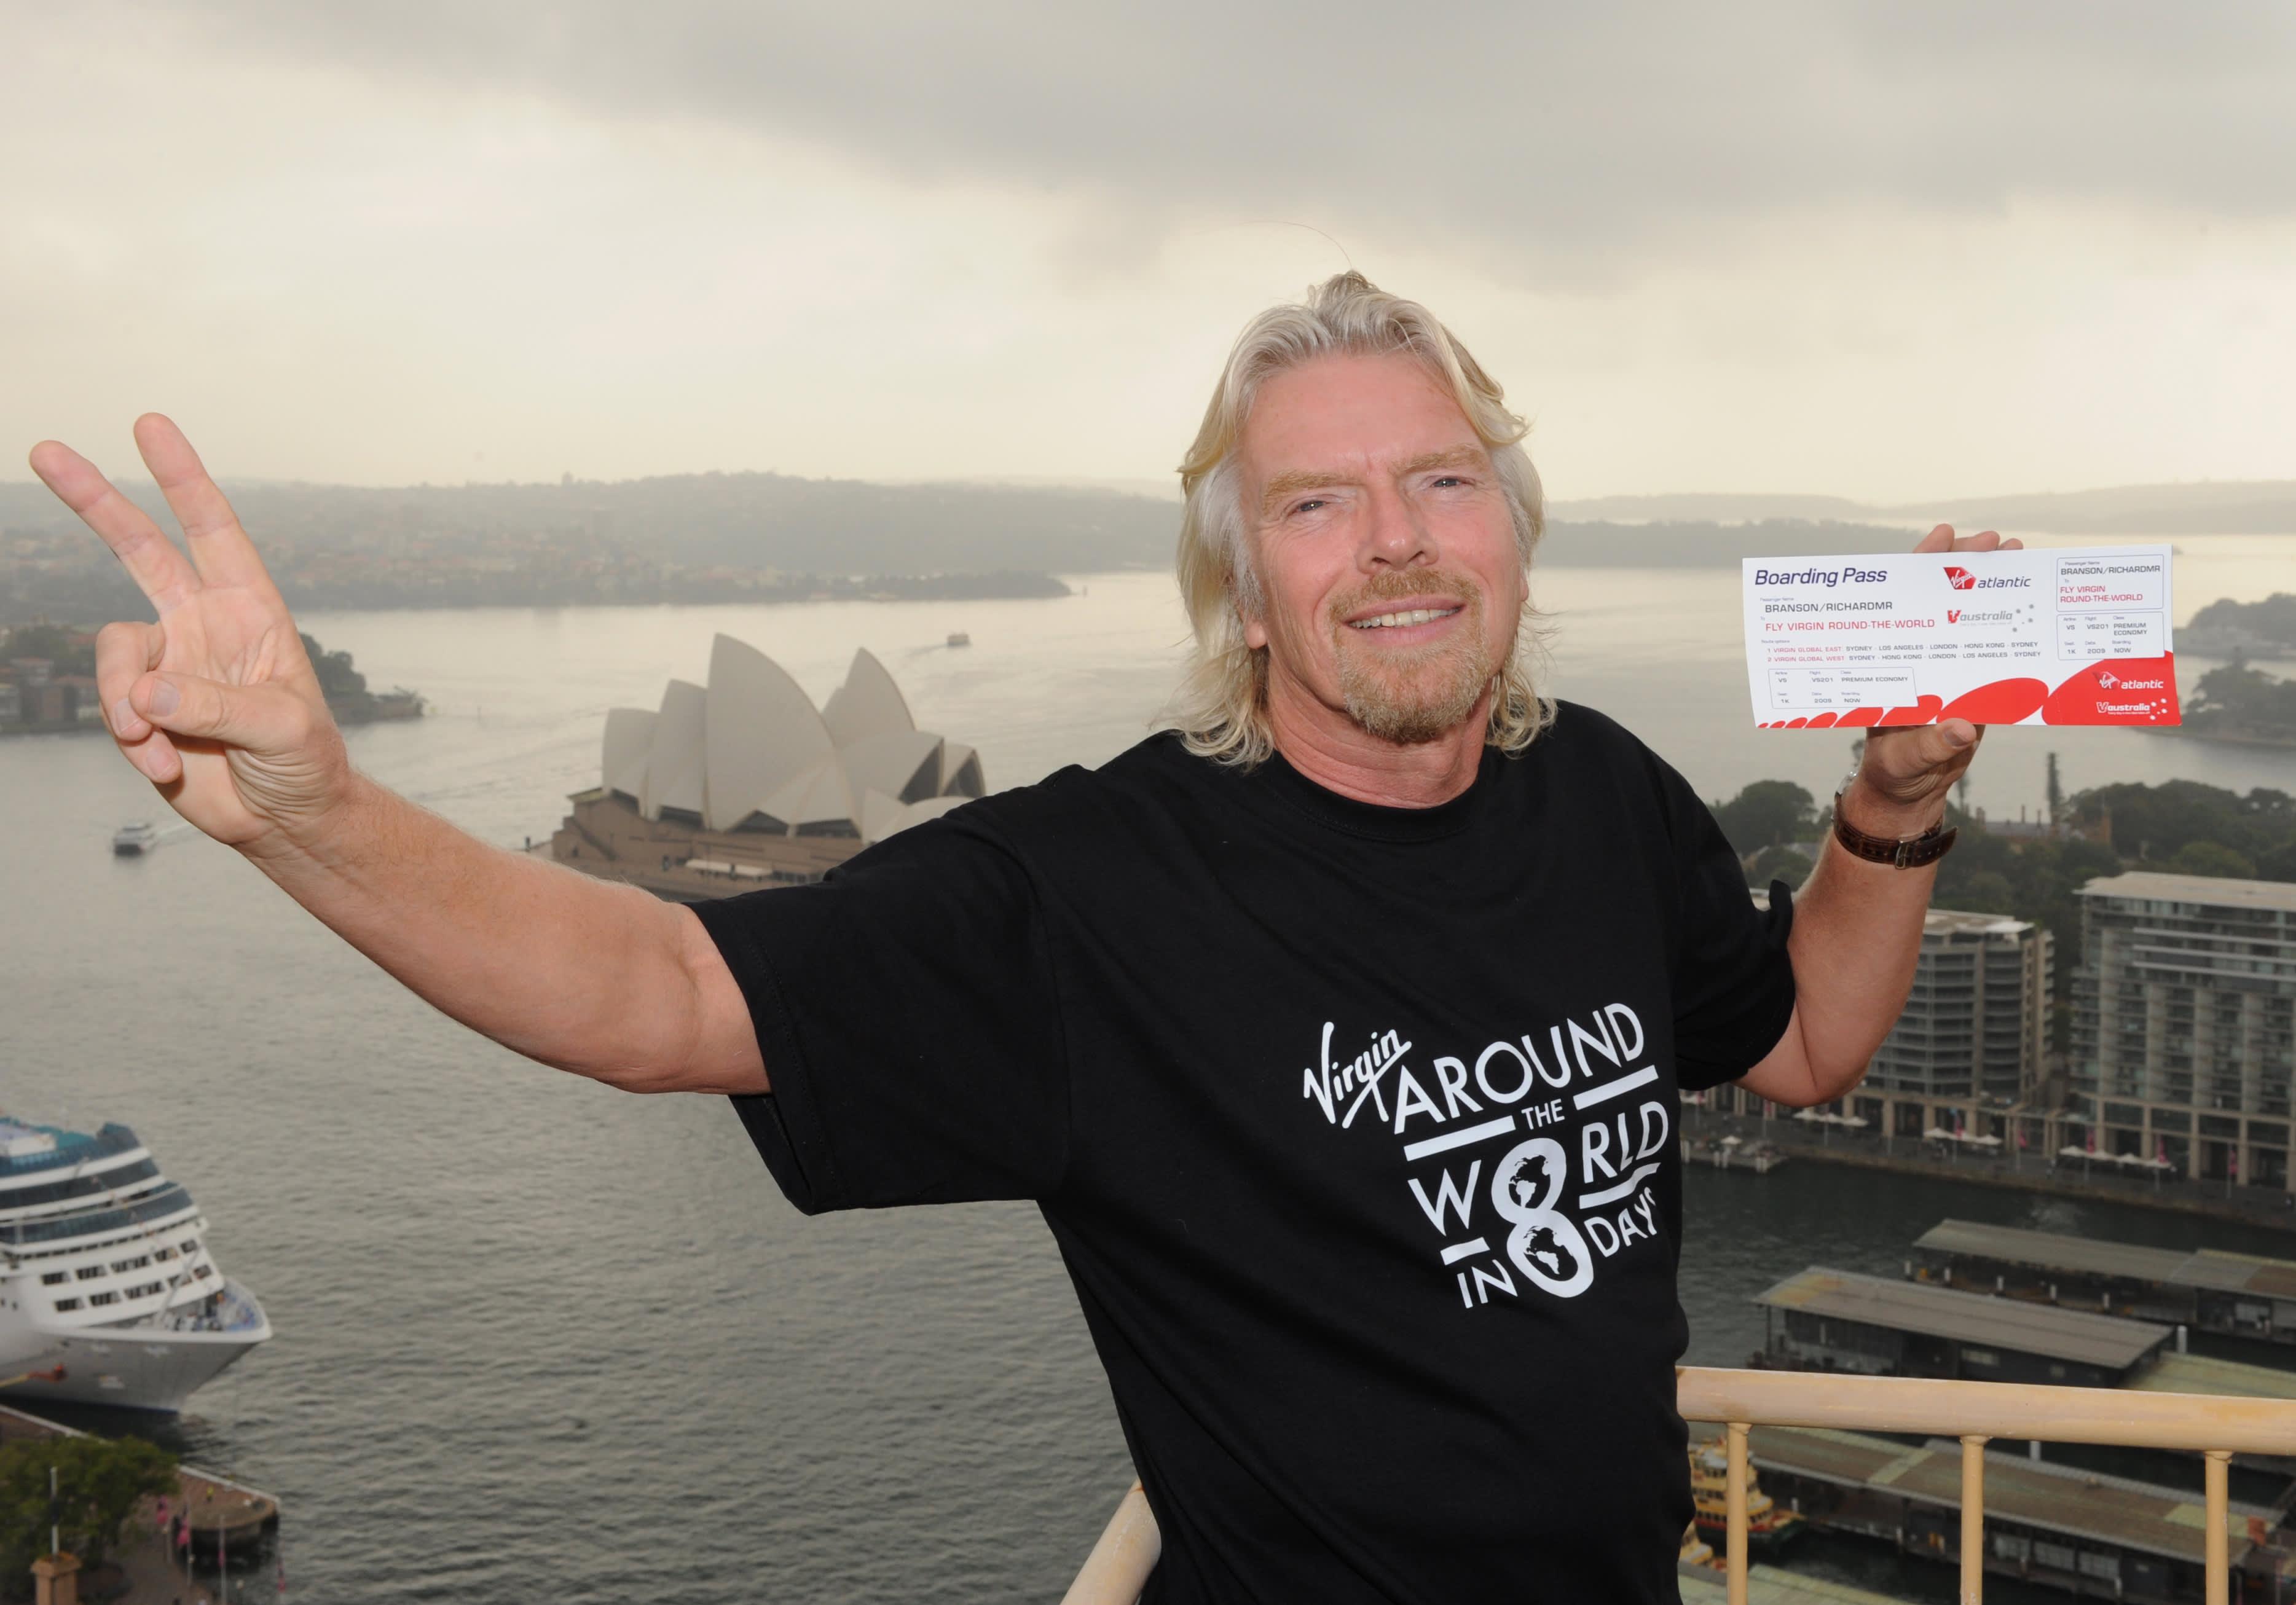 How Richard Branson started Virgin Atlantic with a blackboard selling $39 flights